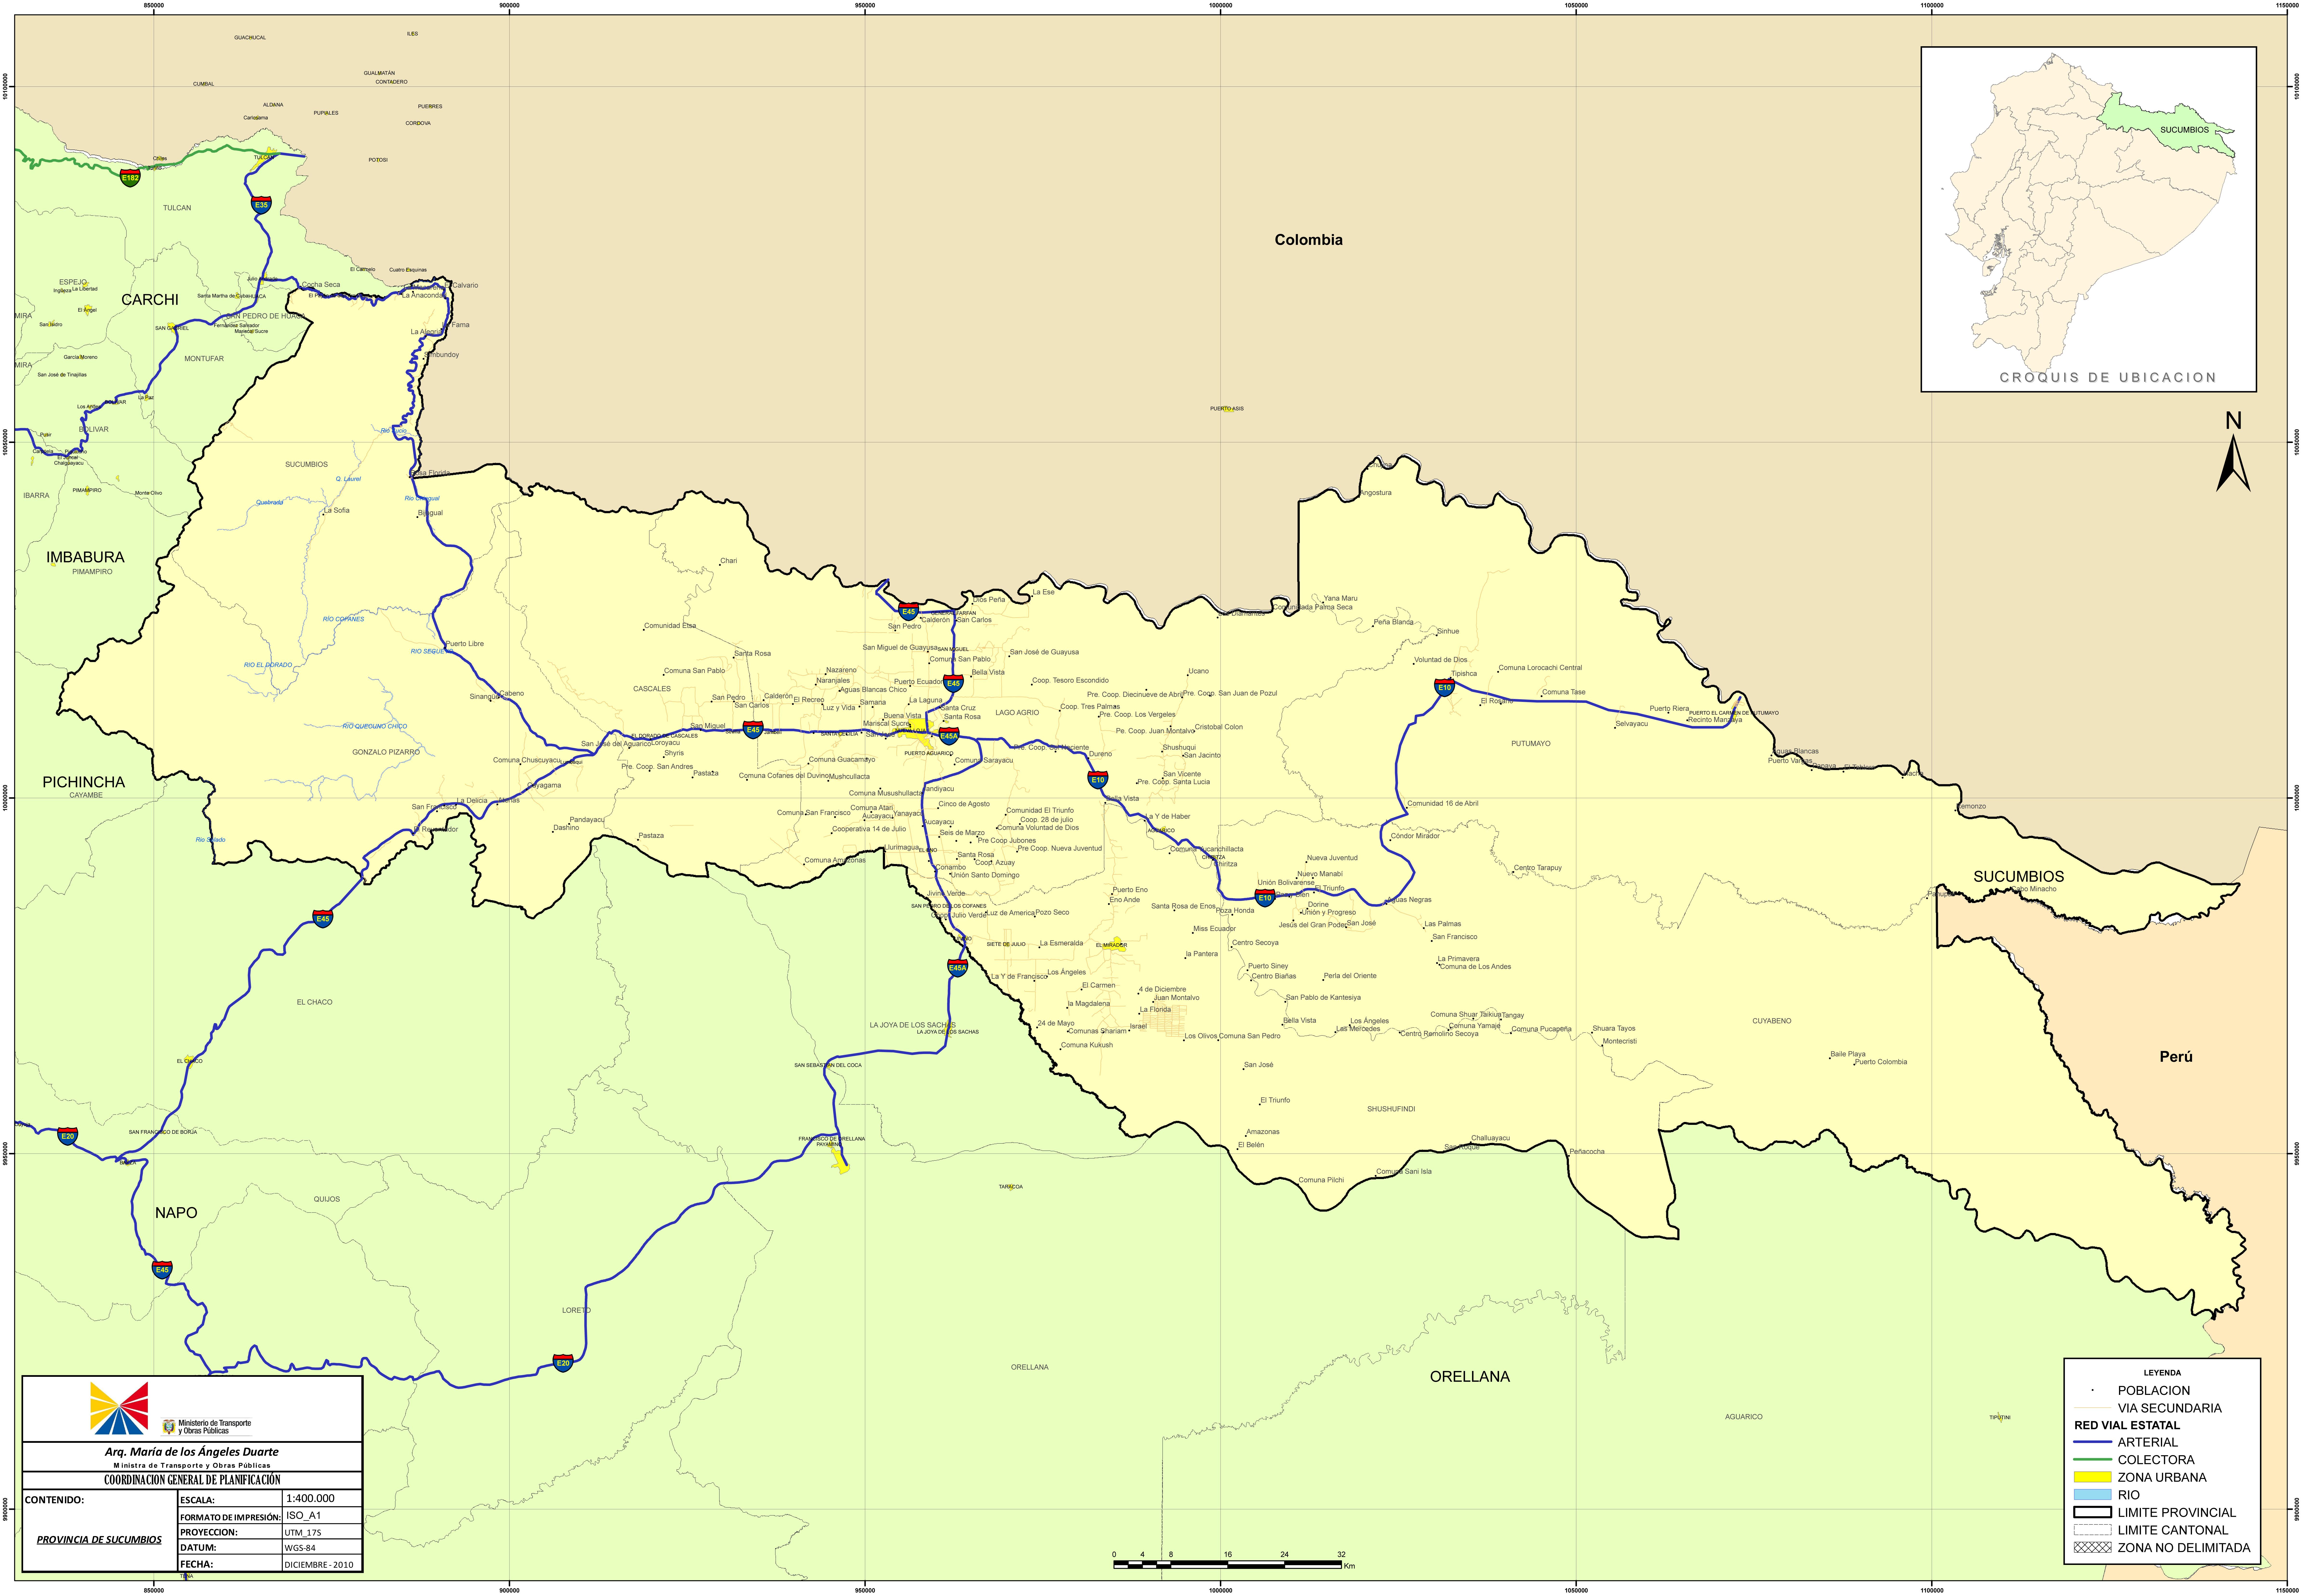 Mapa de Sucumbíos 2010